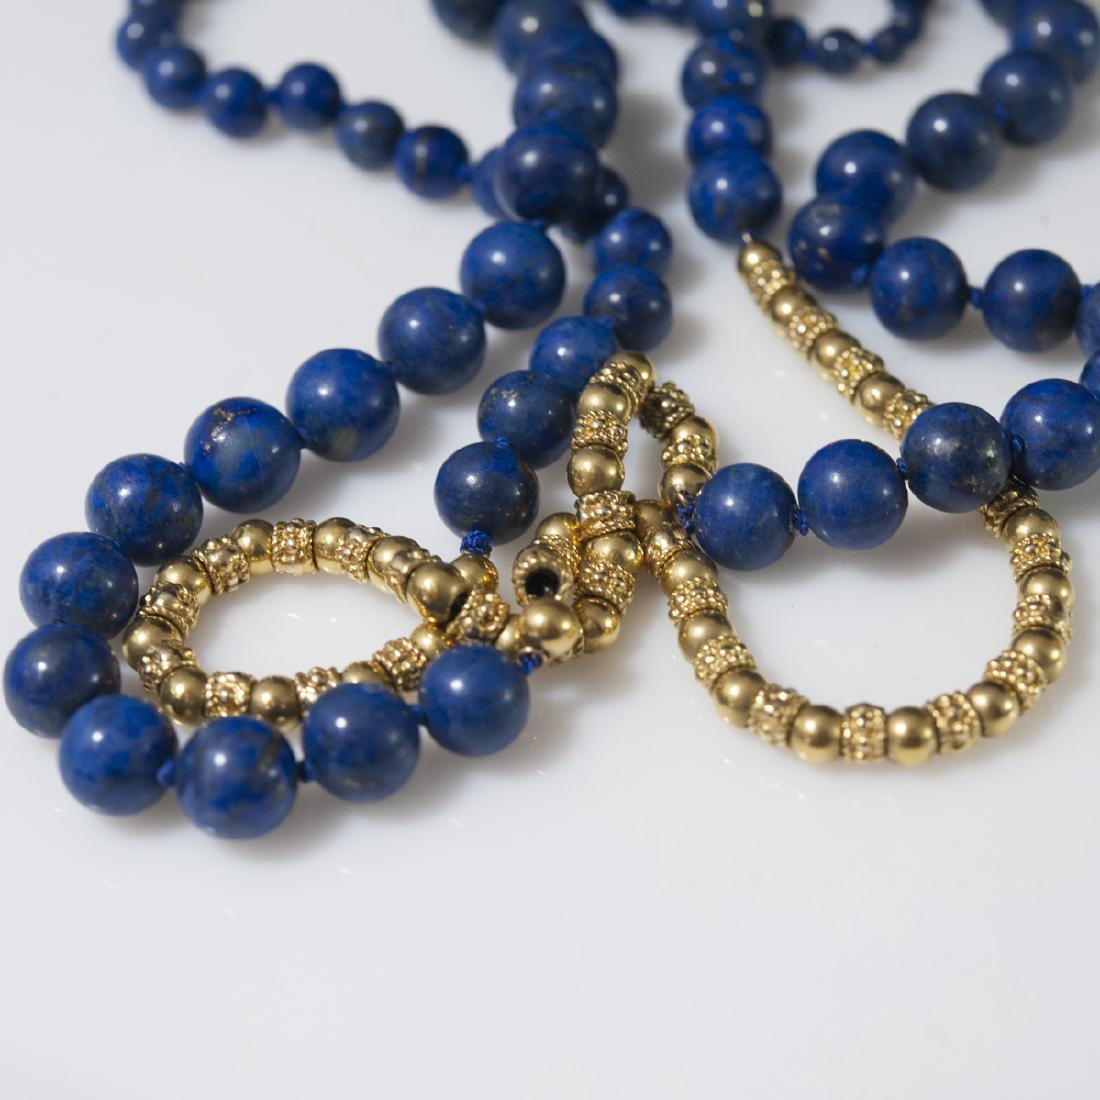 18kt Gold & Lapis Lazuli Necklace - 3